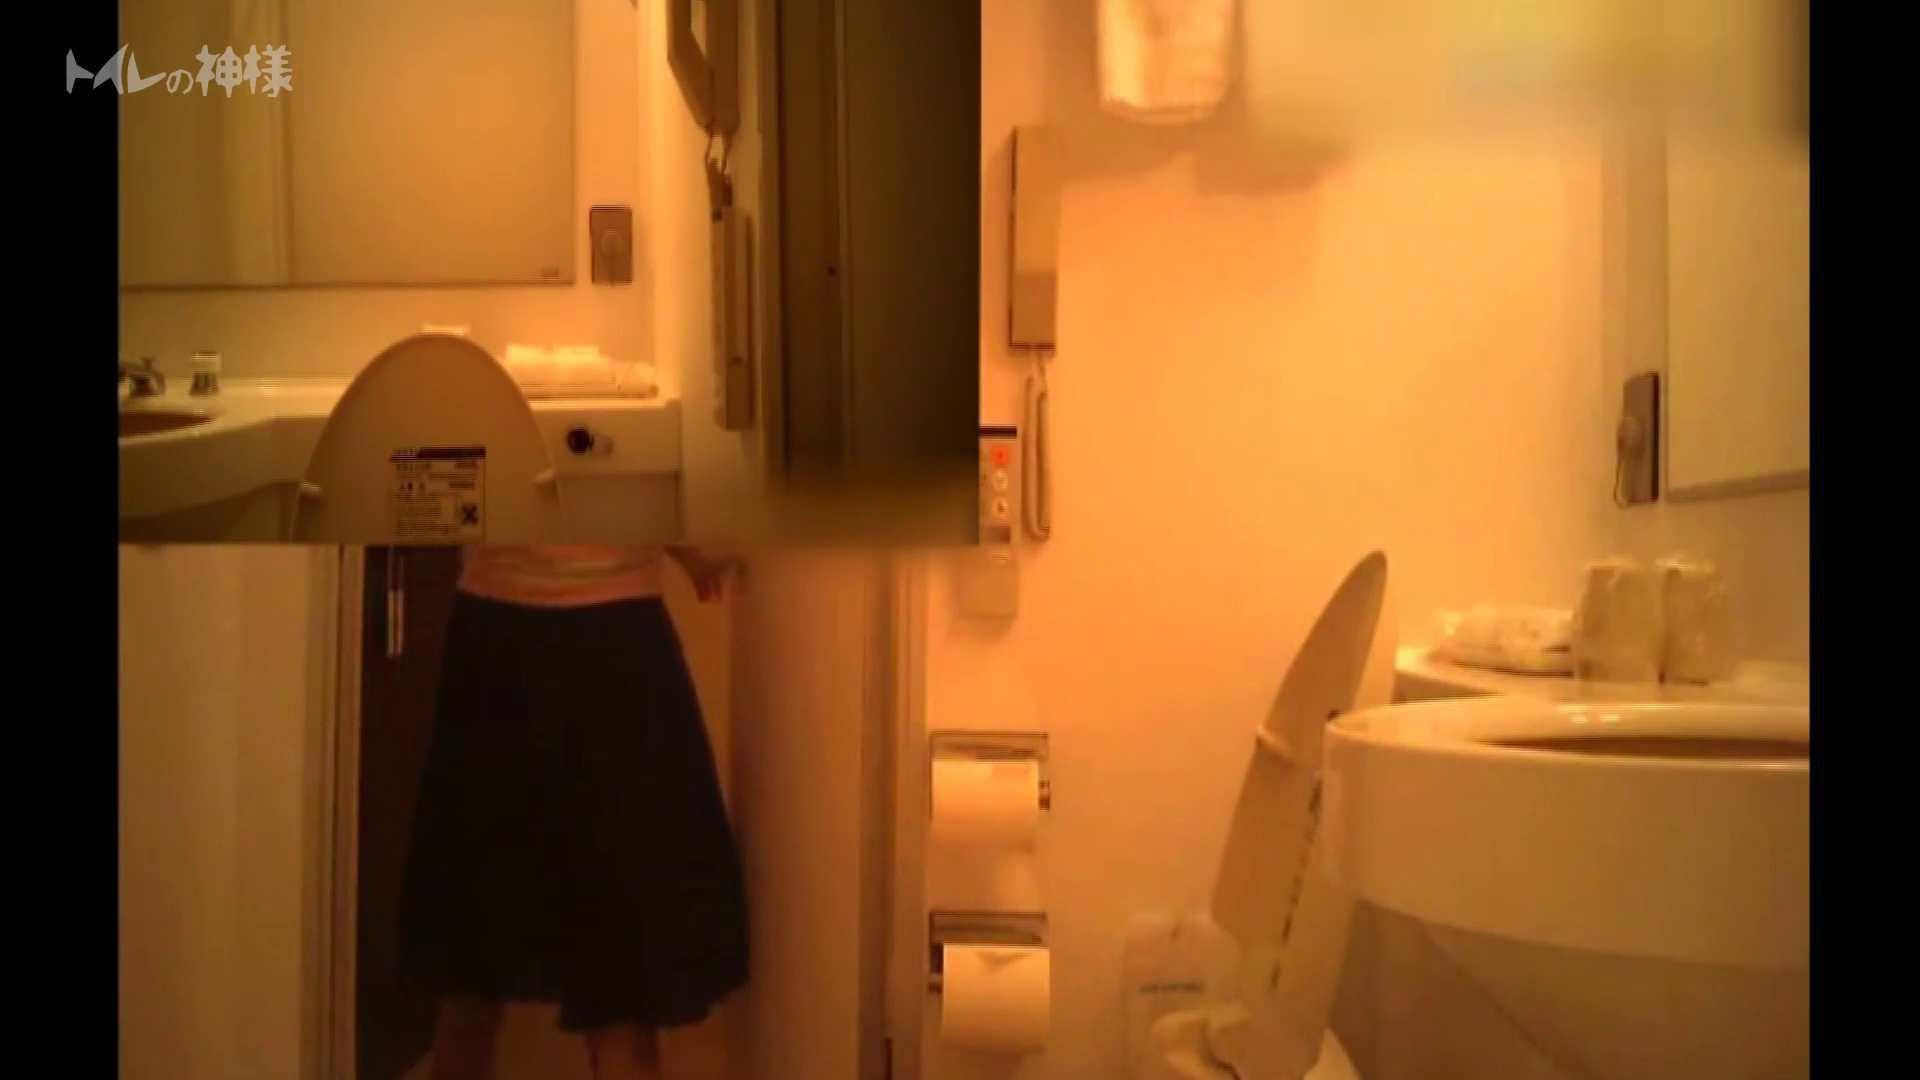 Vol.04 女子大生のトイレ恥態 OLハメ撮り  104Pix 31